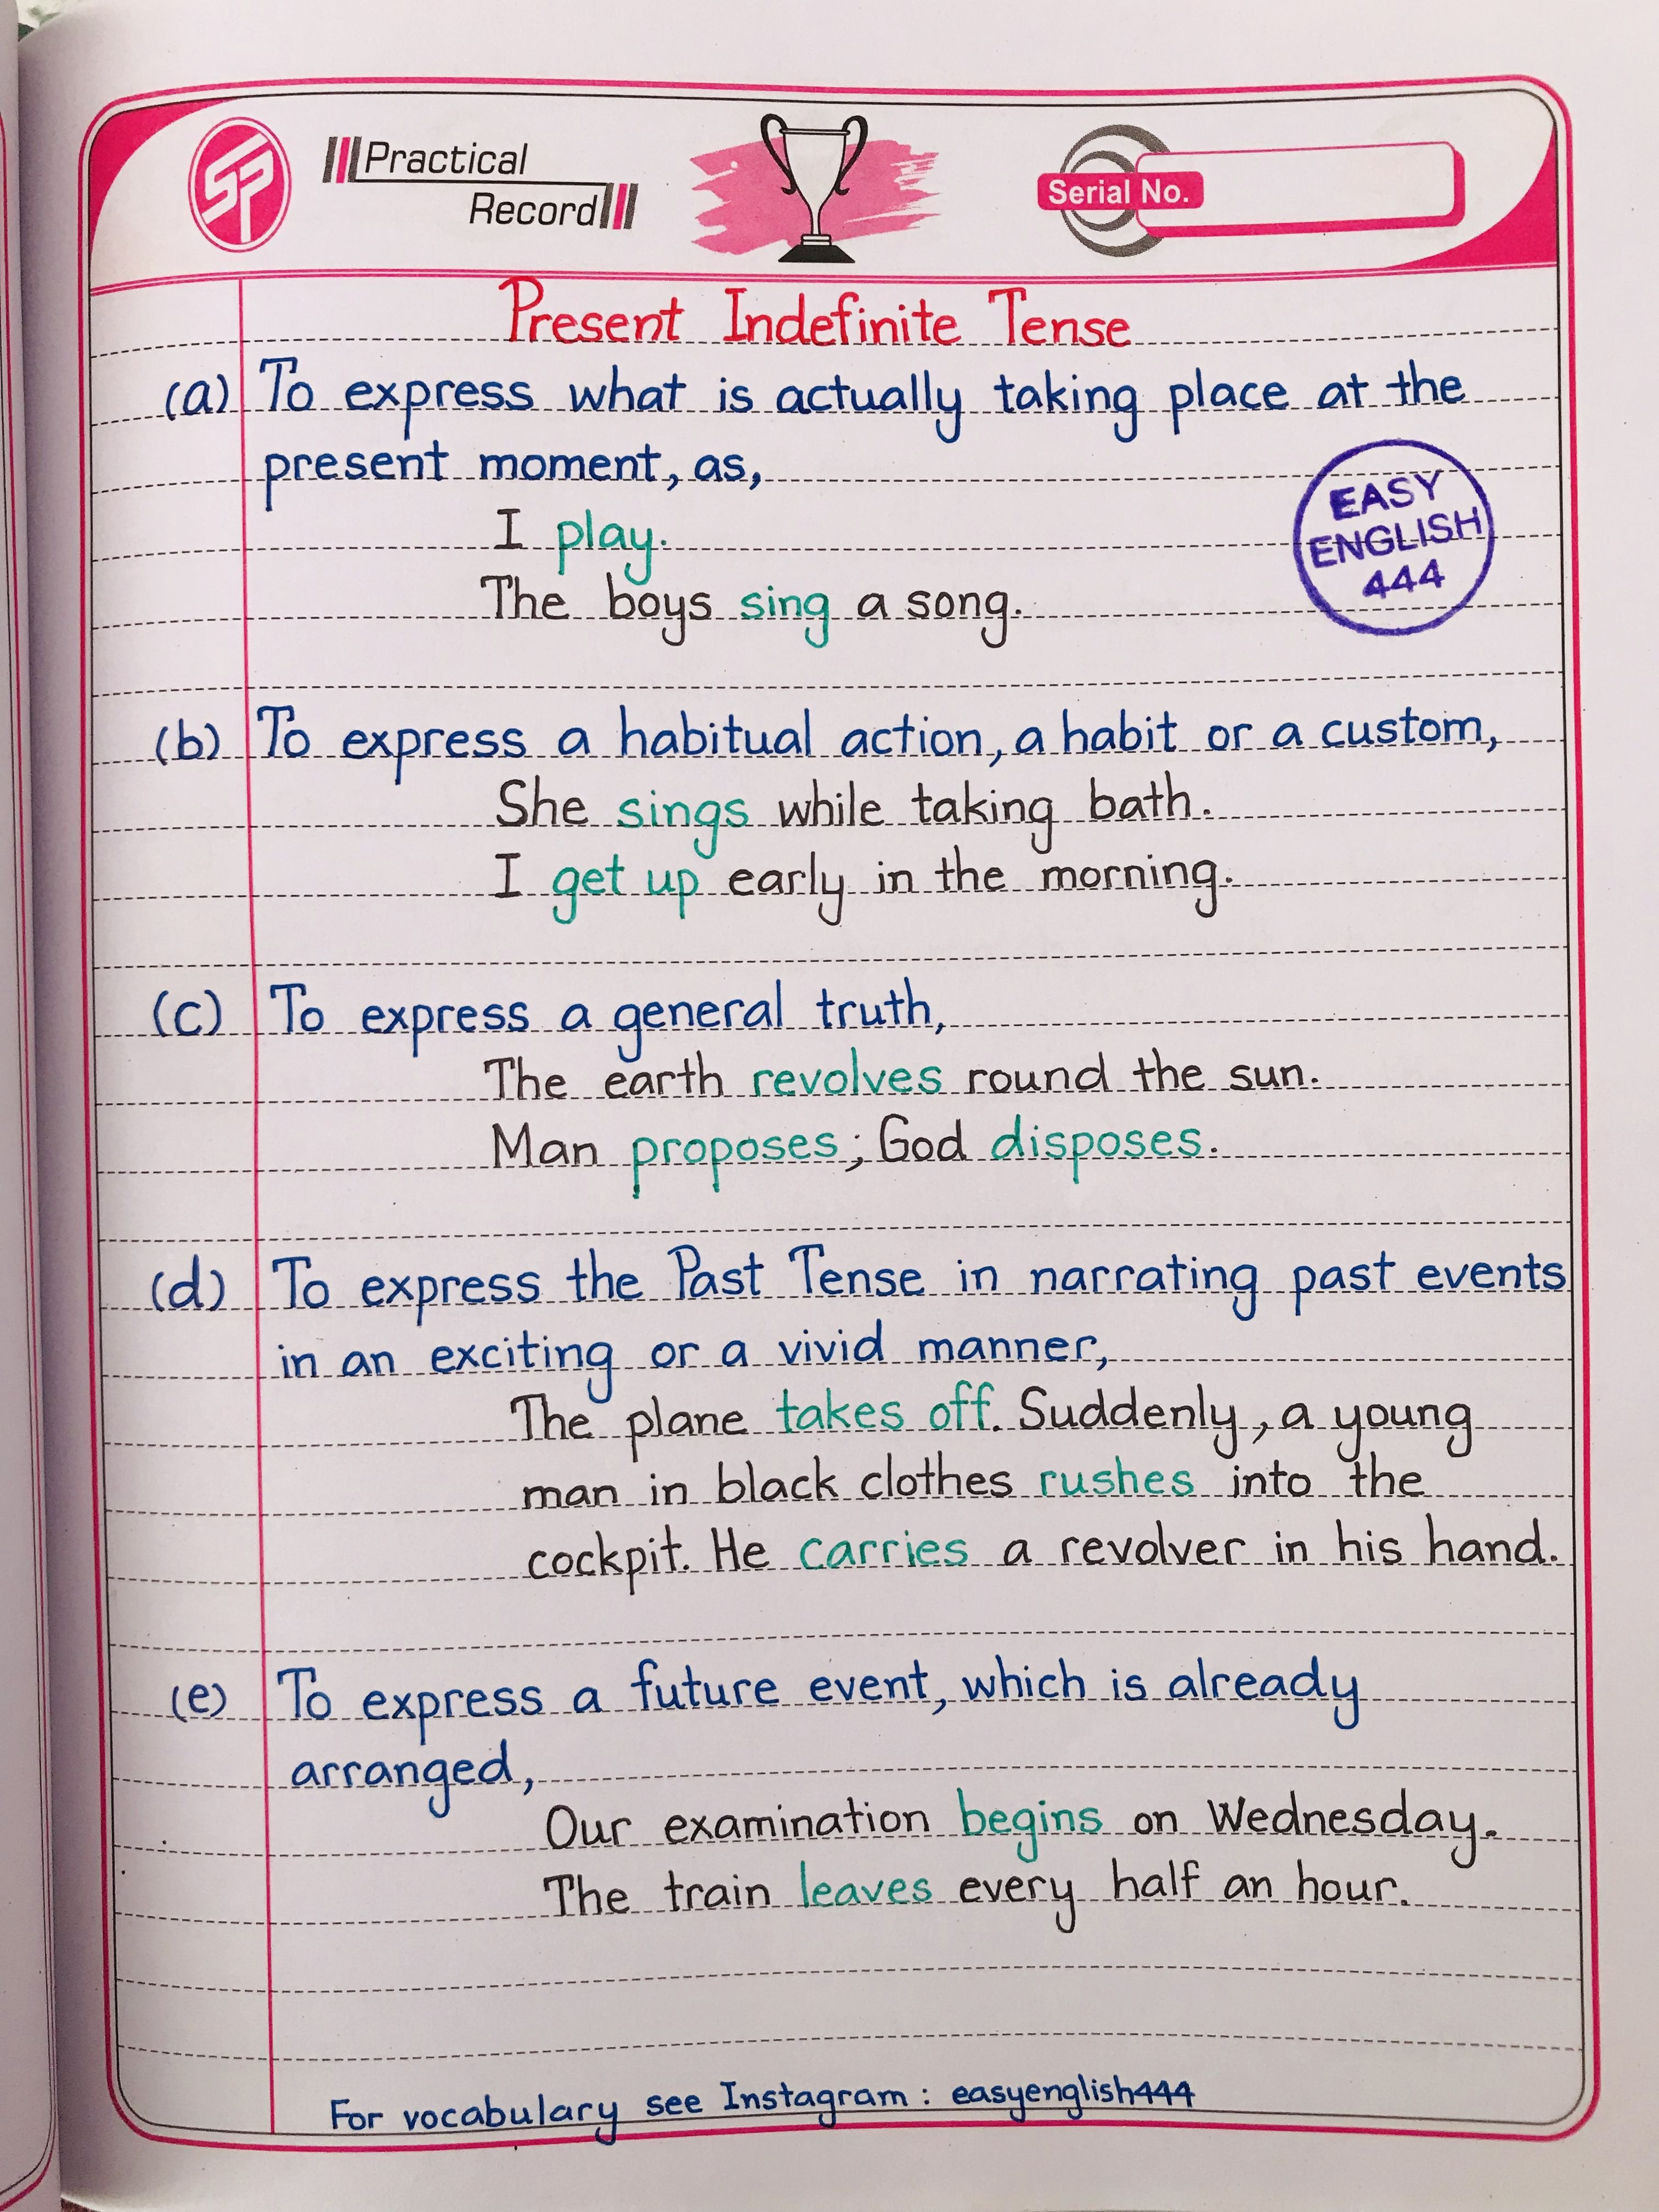 learn english grammar Learn english words, English